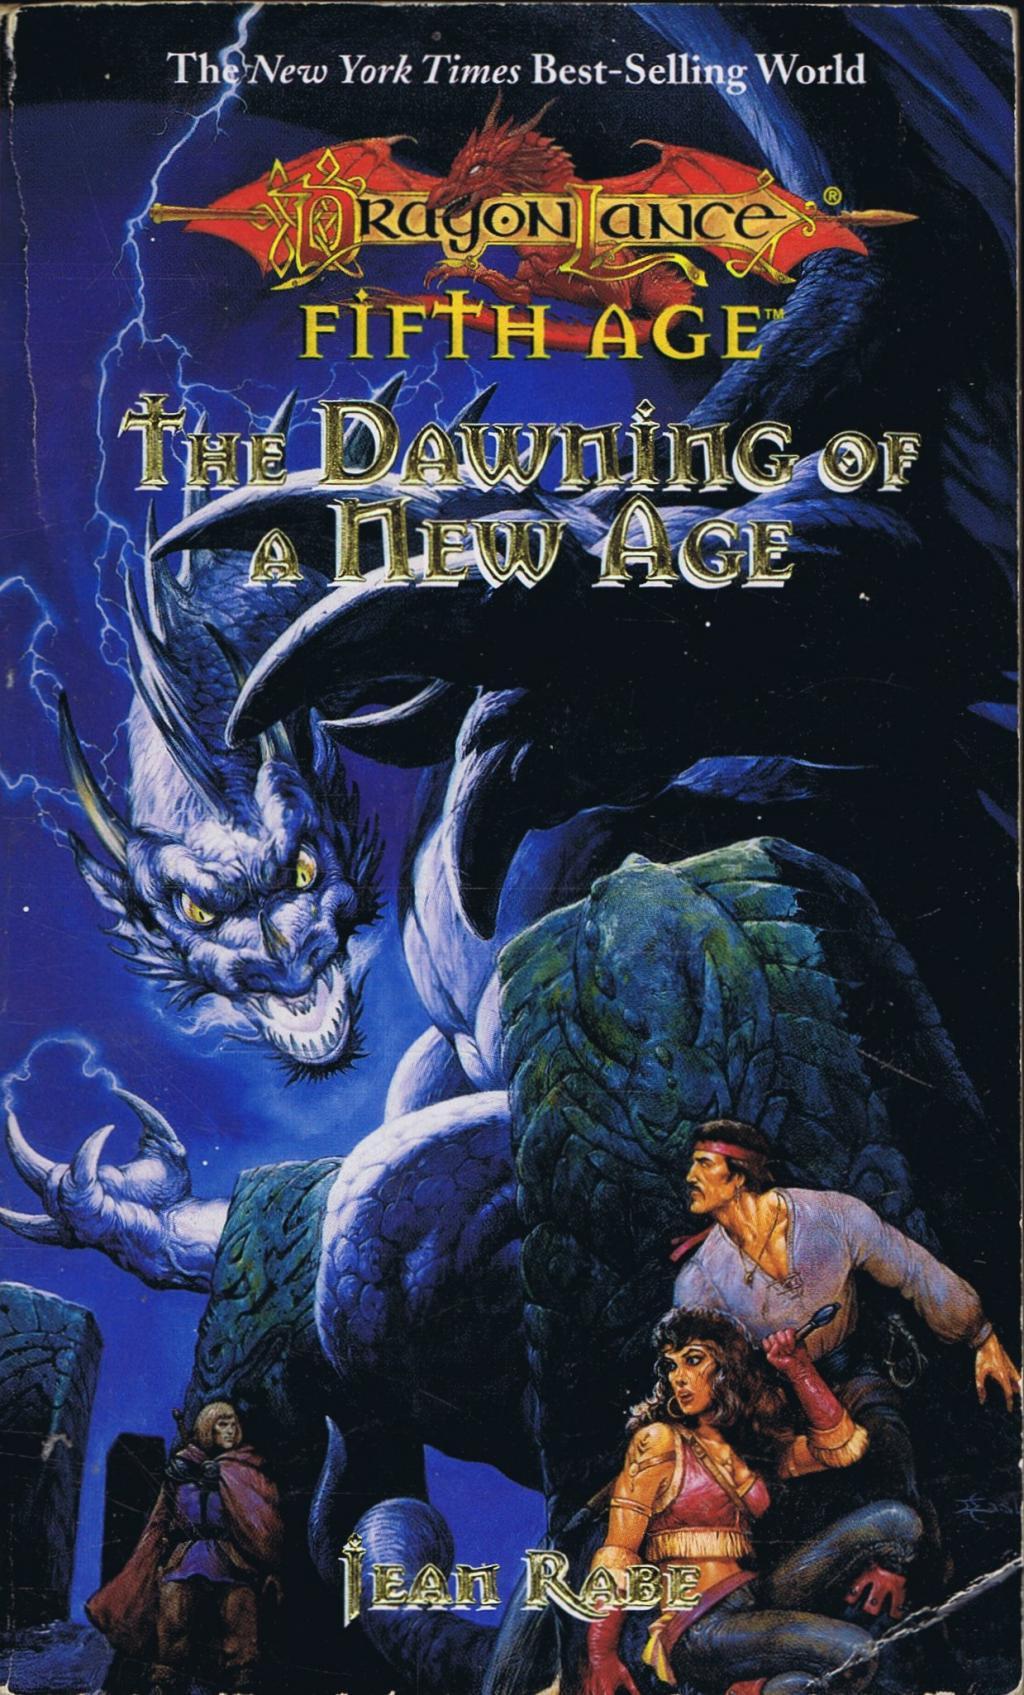 The Dawning Of New Age Av Jean Rabe (Pocket)